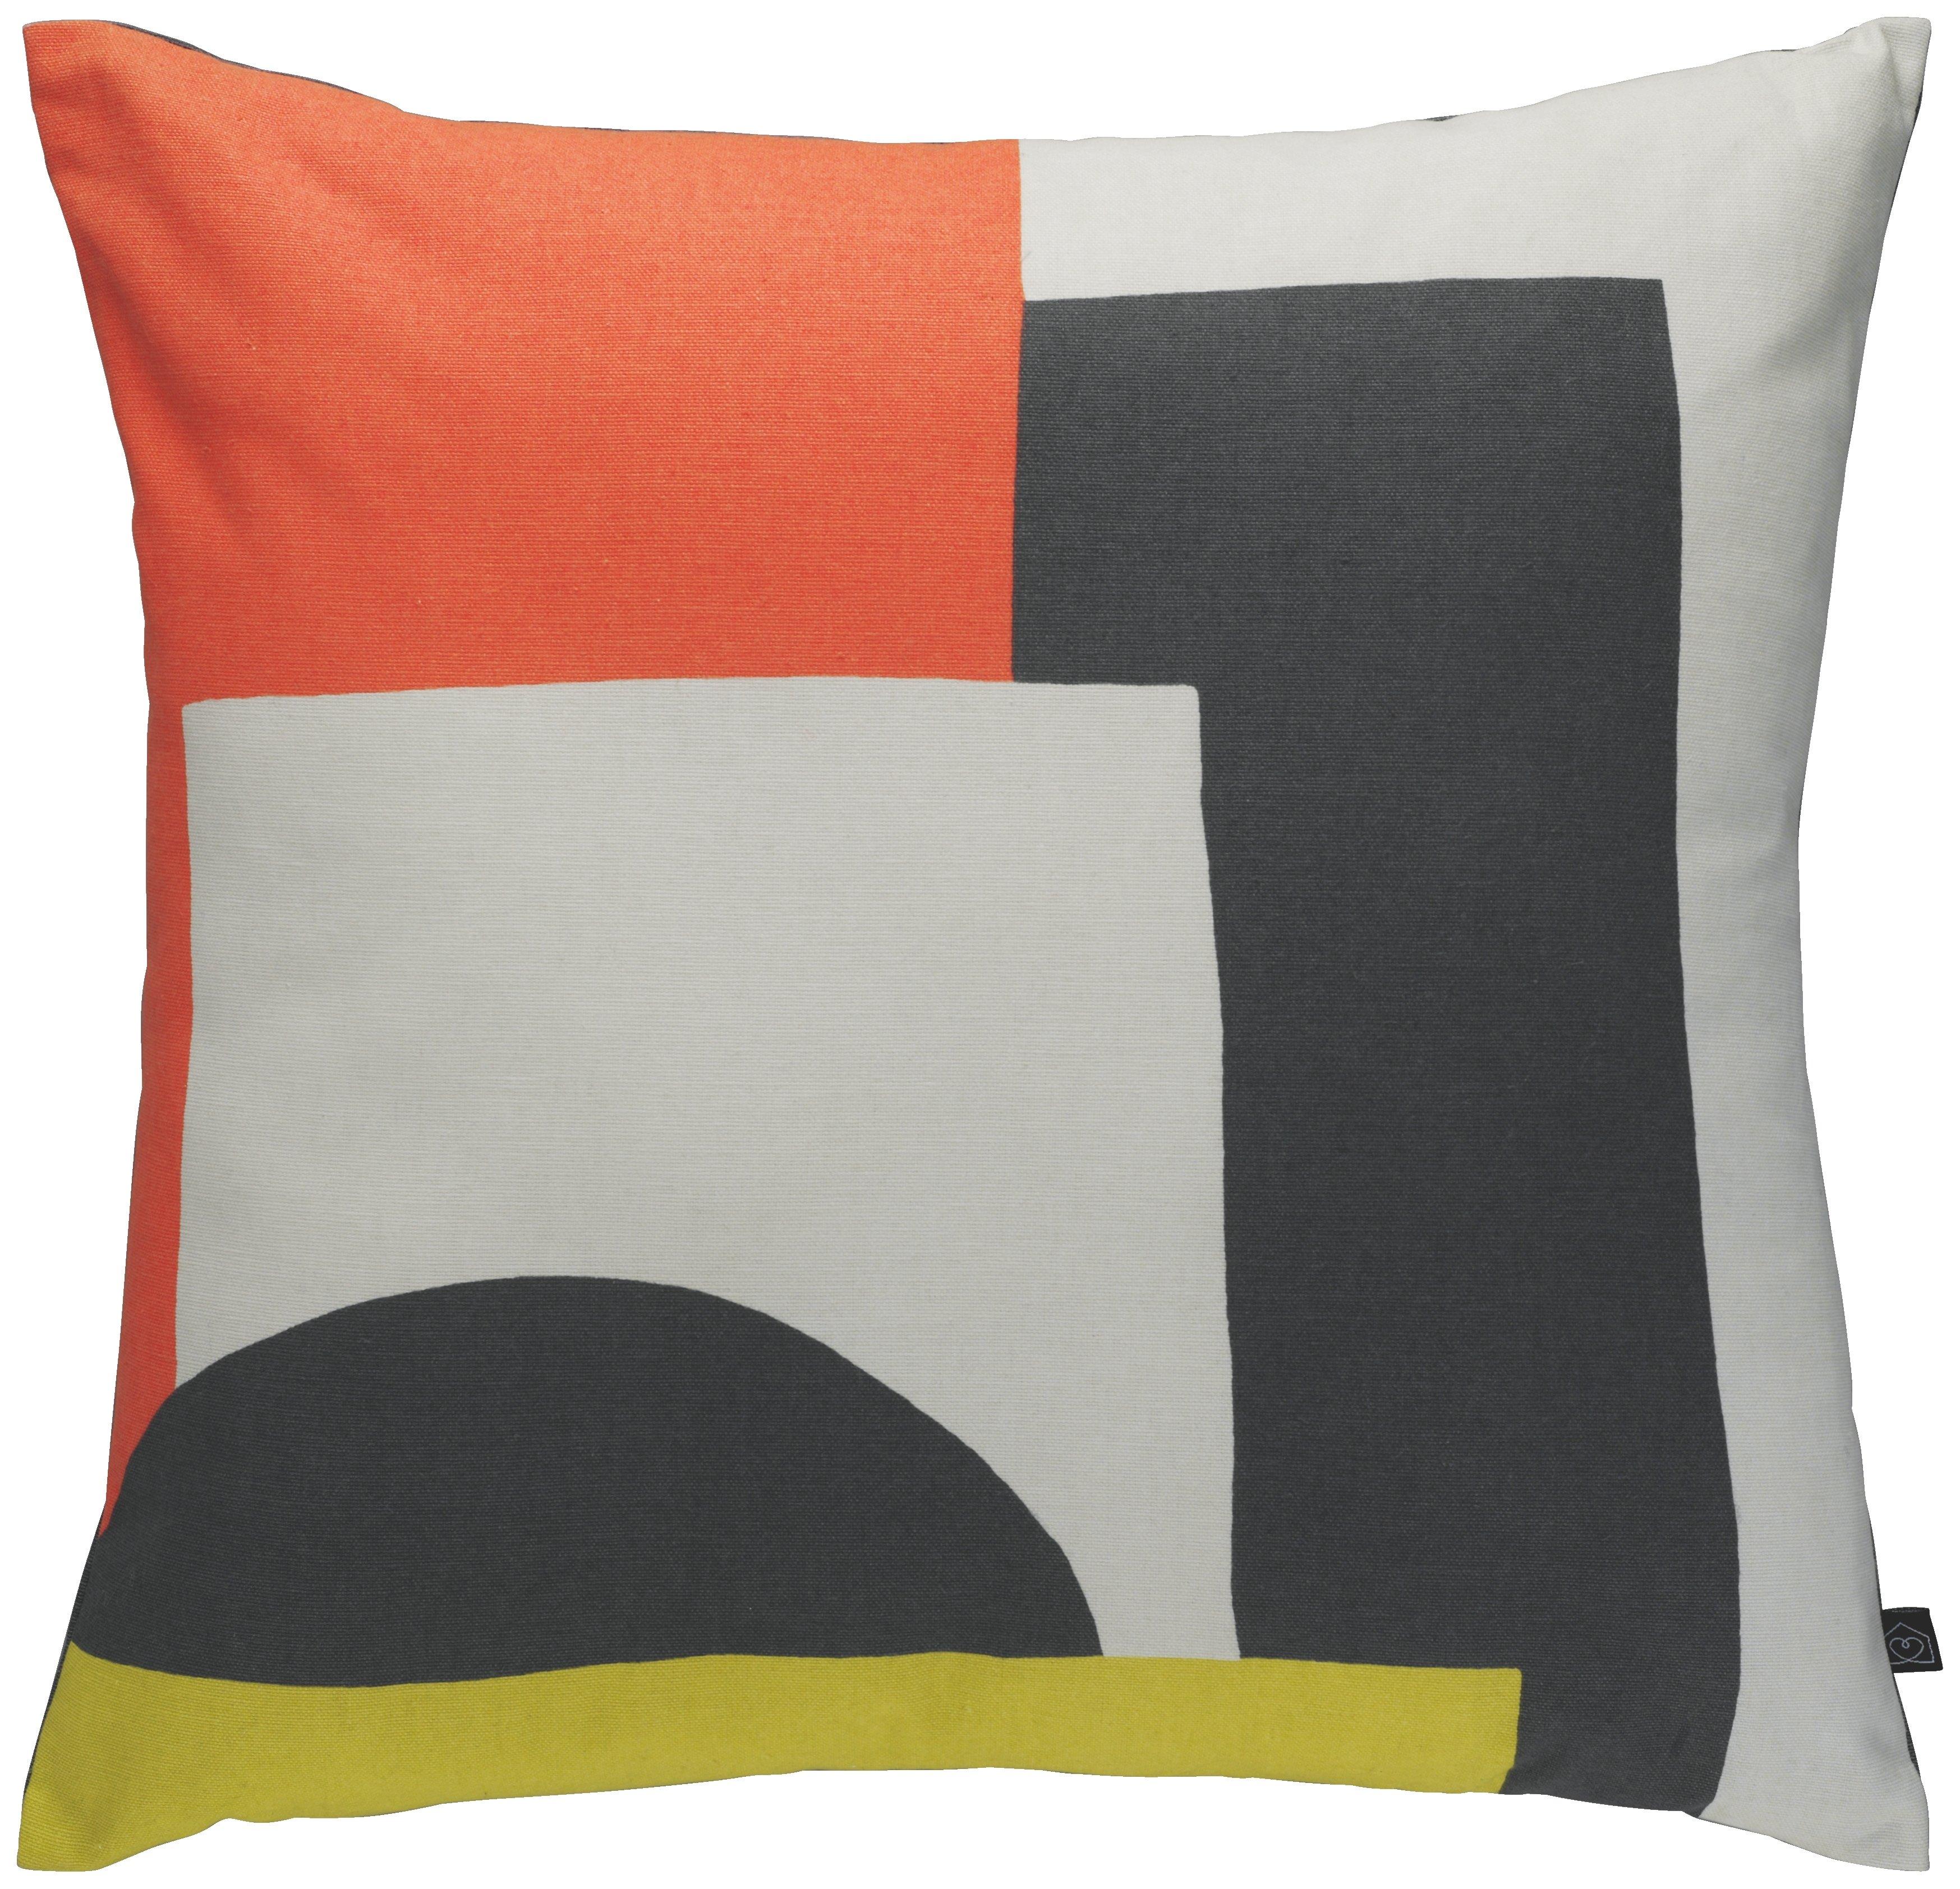 sale on habitat miro cushion habitat now available our. Black Bedroom Furniture Sets. Home Design Ideas